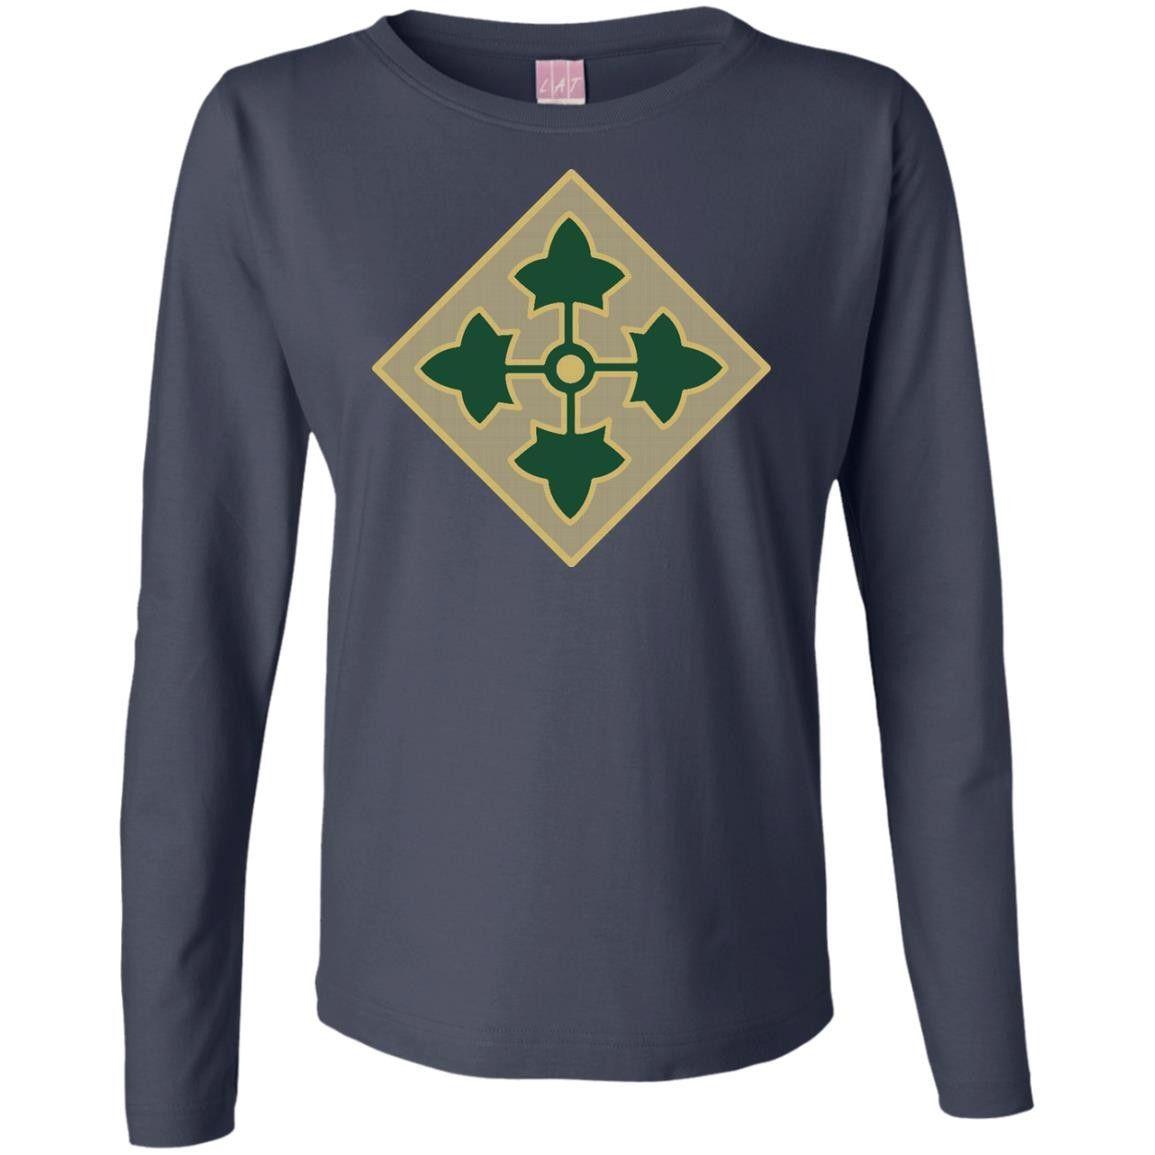 Army 4th Infantry Division Veteran Unit 1-01 Ladies' Long Sleeve Cotton TShirt